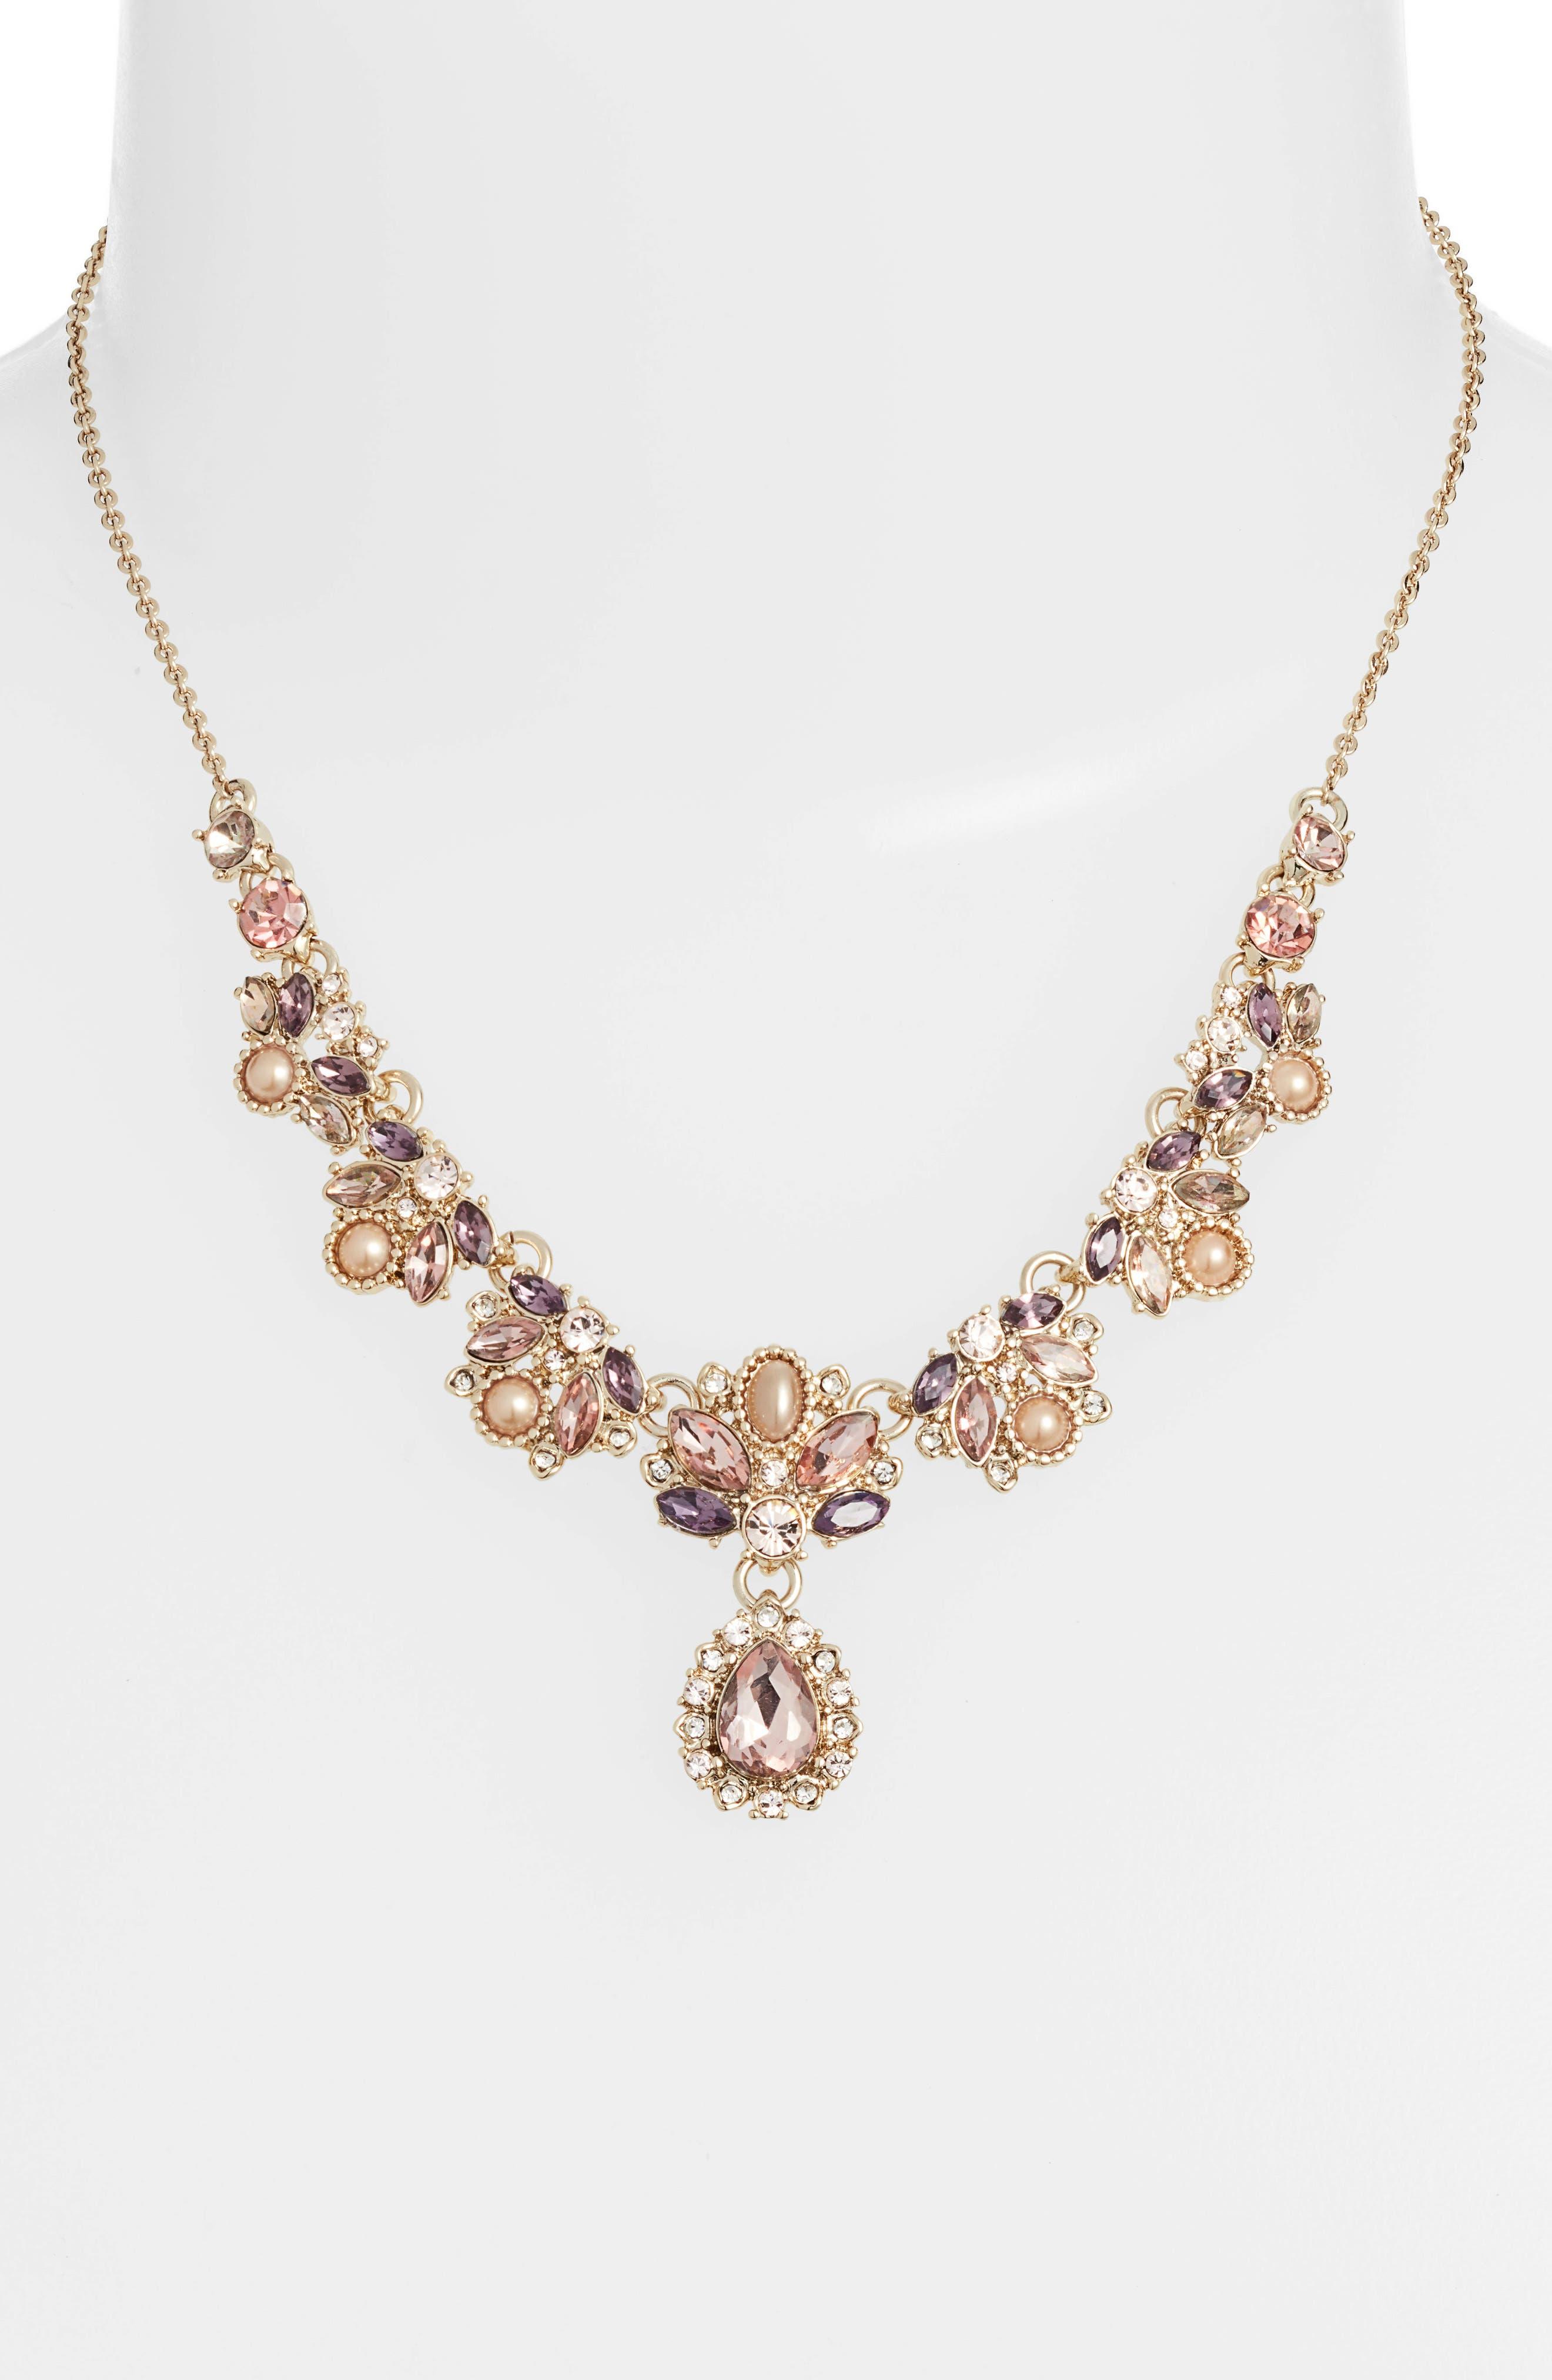 MARCHESA, Crystal & Imitation Pearl Necklace, Alternate thumbnail 2, color, GOLD/ BLUSH/ PURPLE